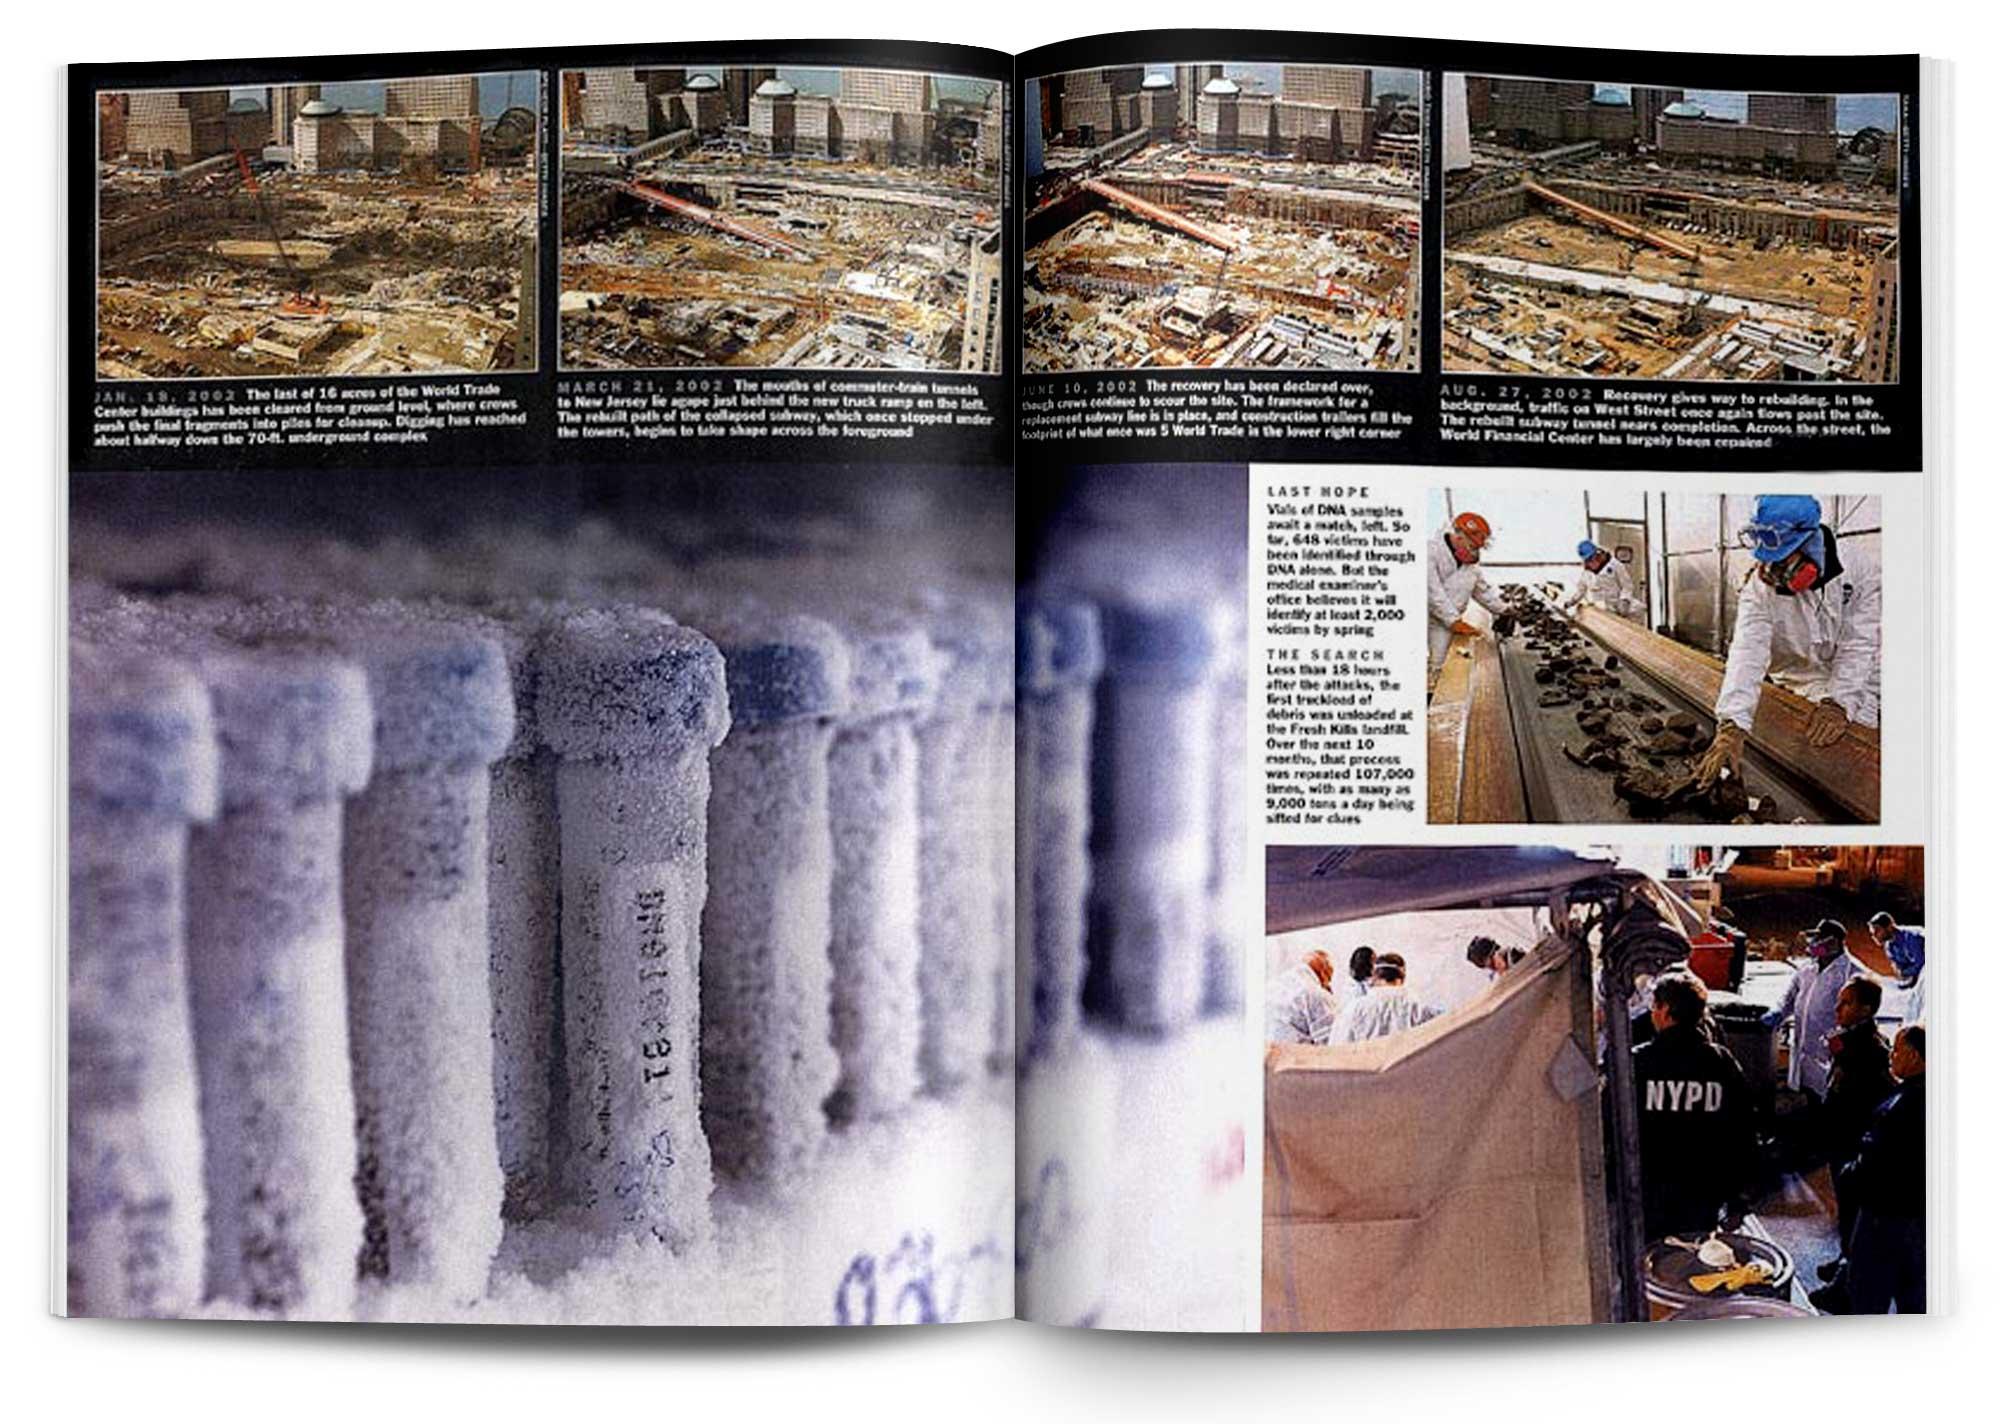 layouts.9.11graphic2.jpg